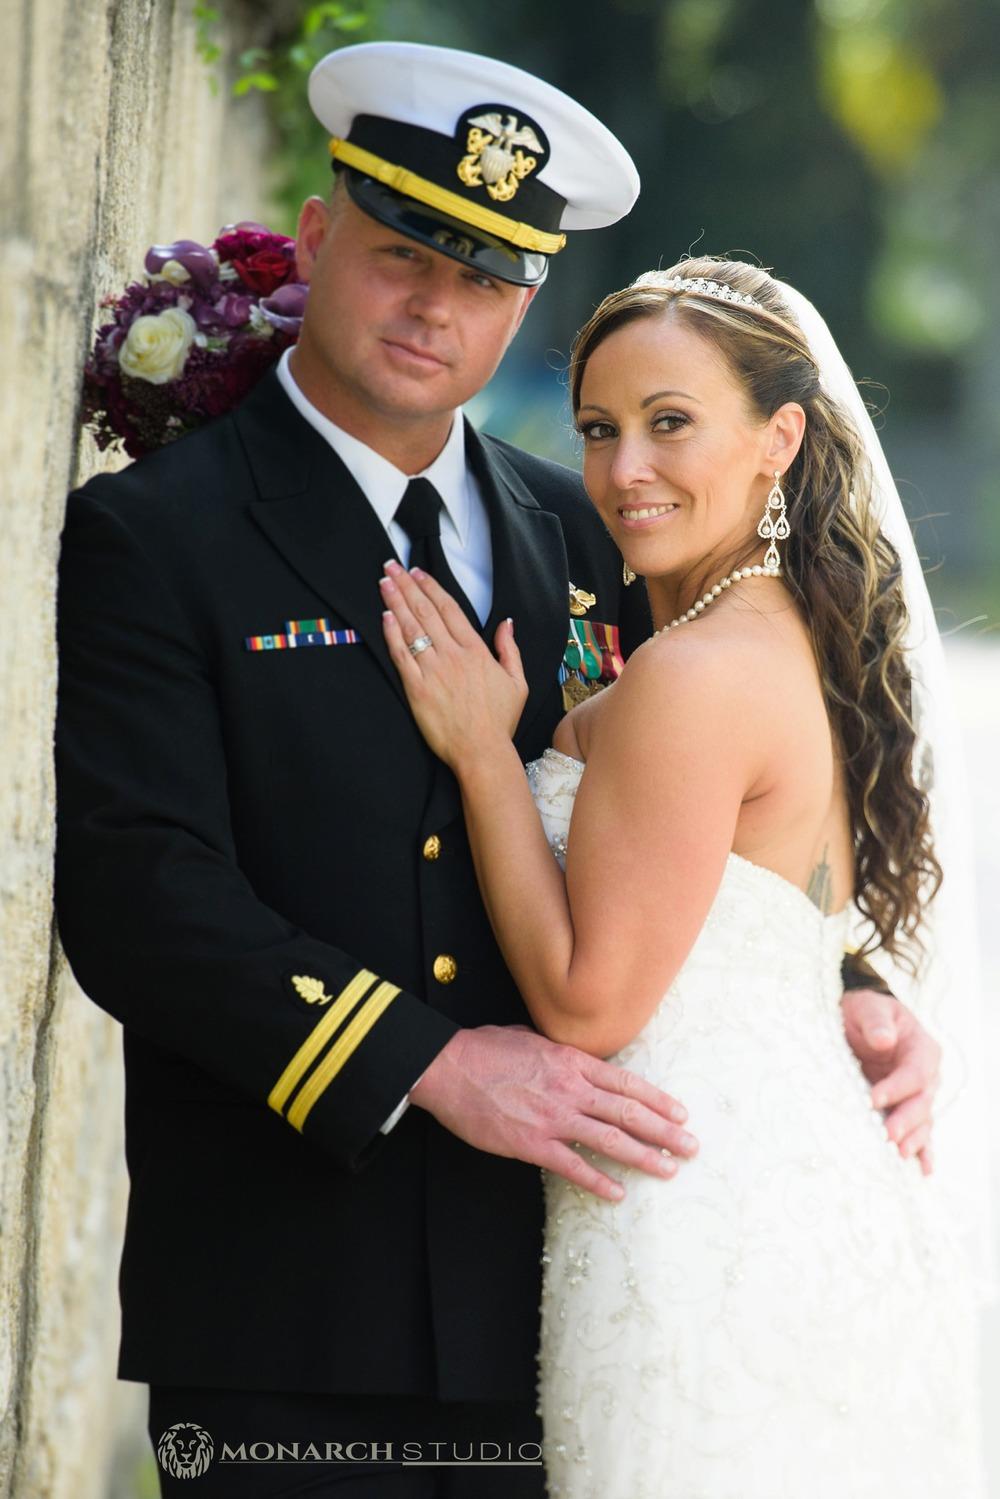 Monarch Studio Wedding Photographers